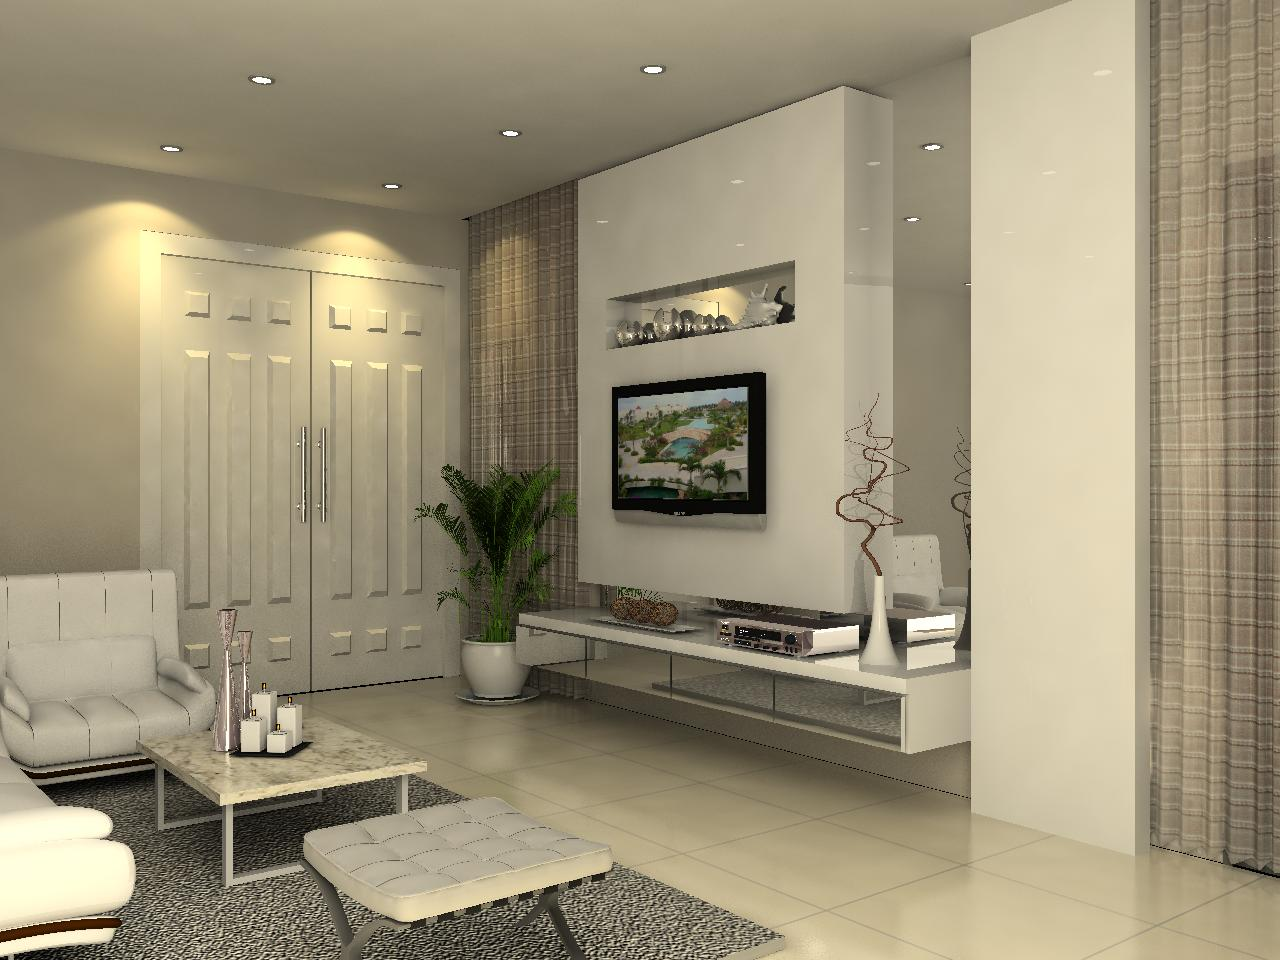 pin tv console design ideas on pinterest. Black Bedroom Furniture Sets. Home Design Ideas